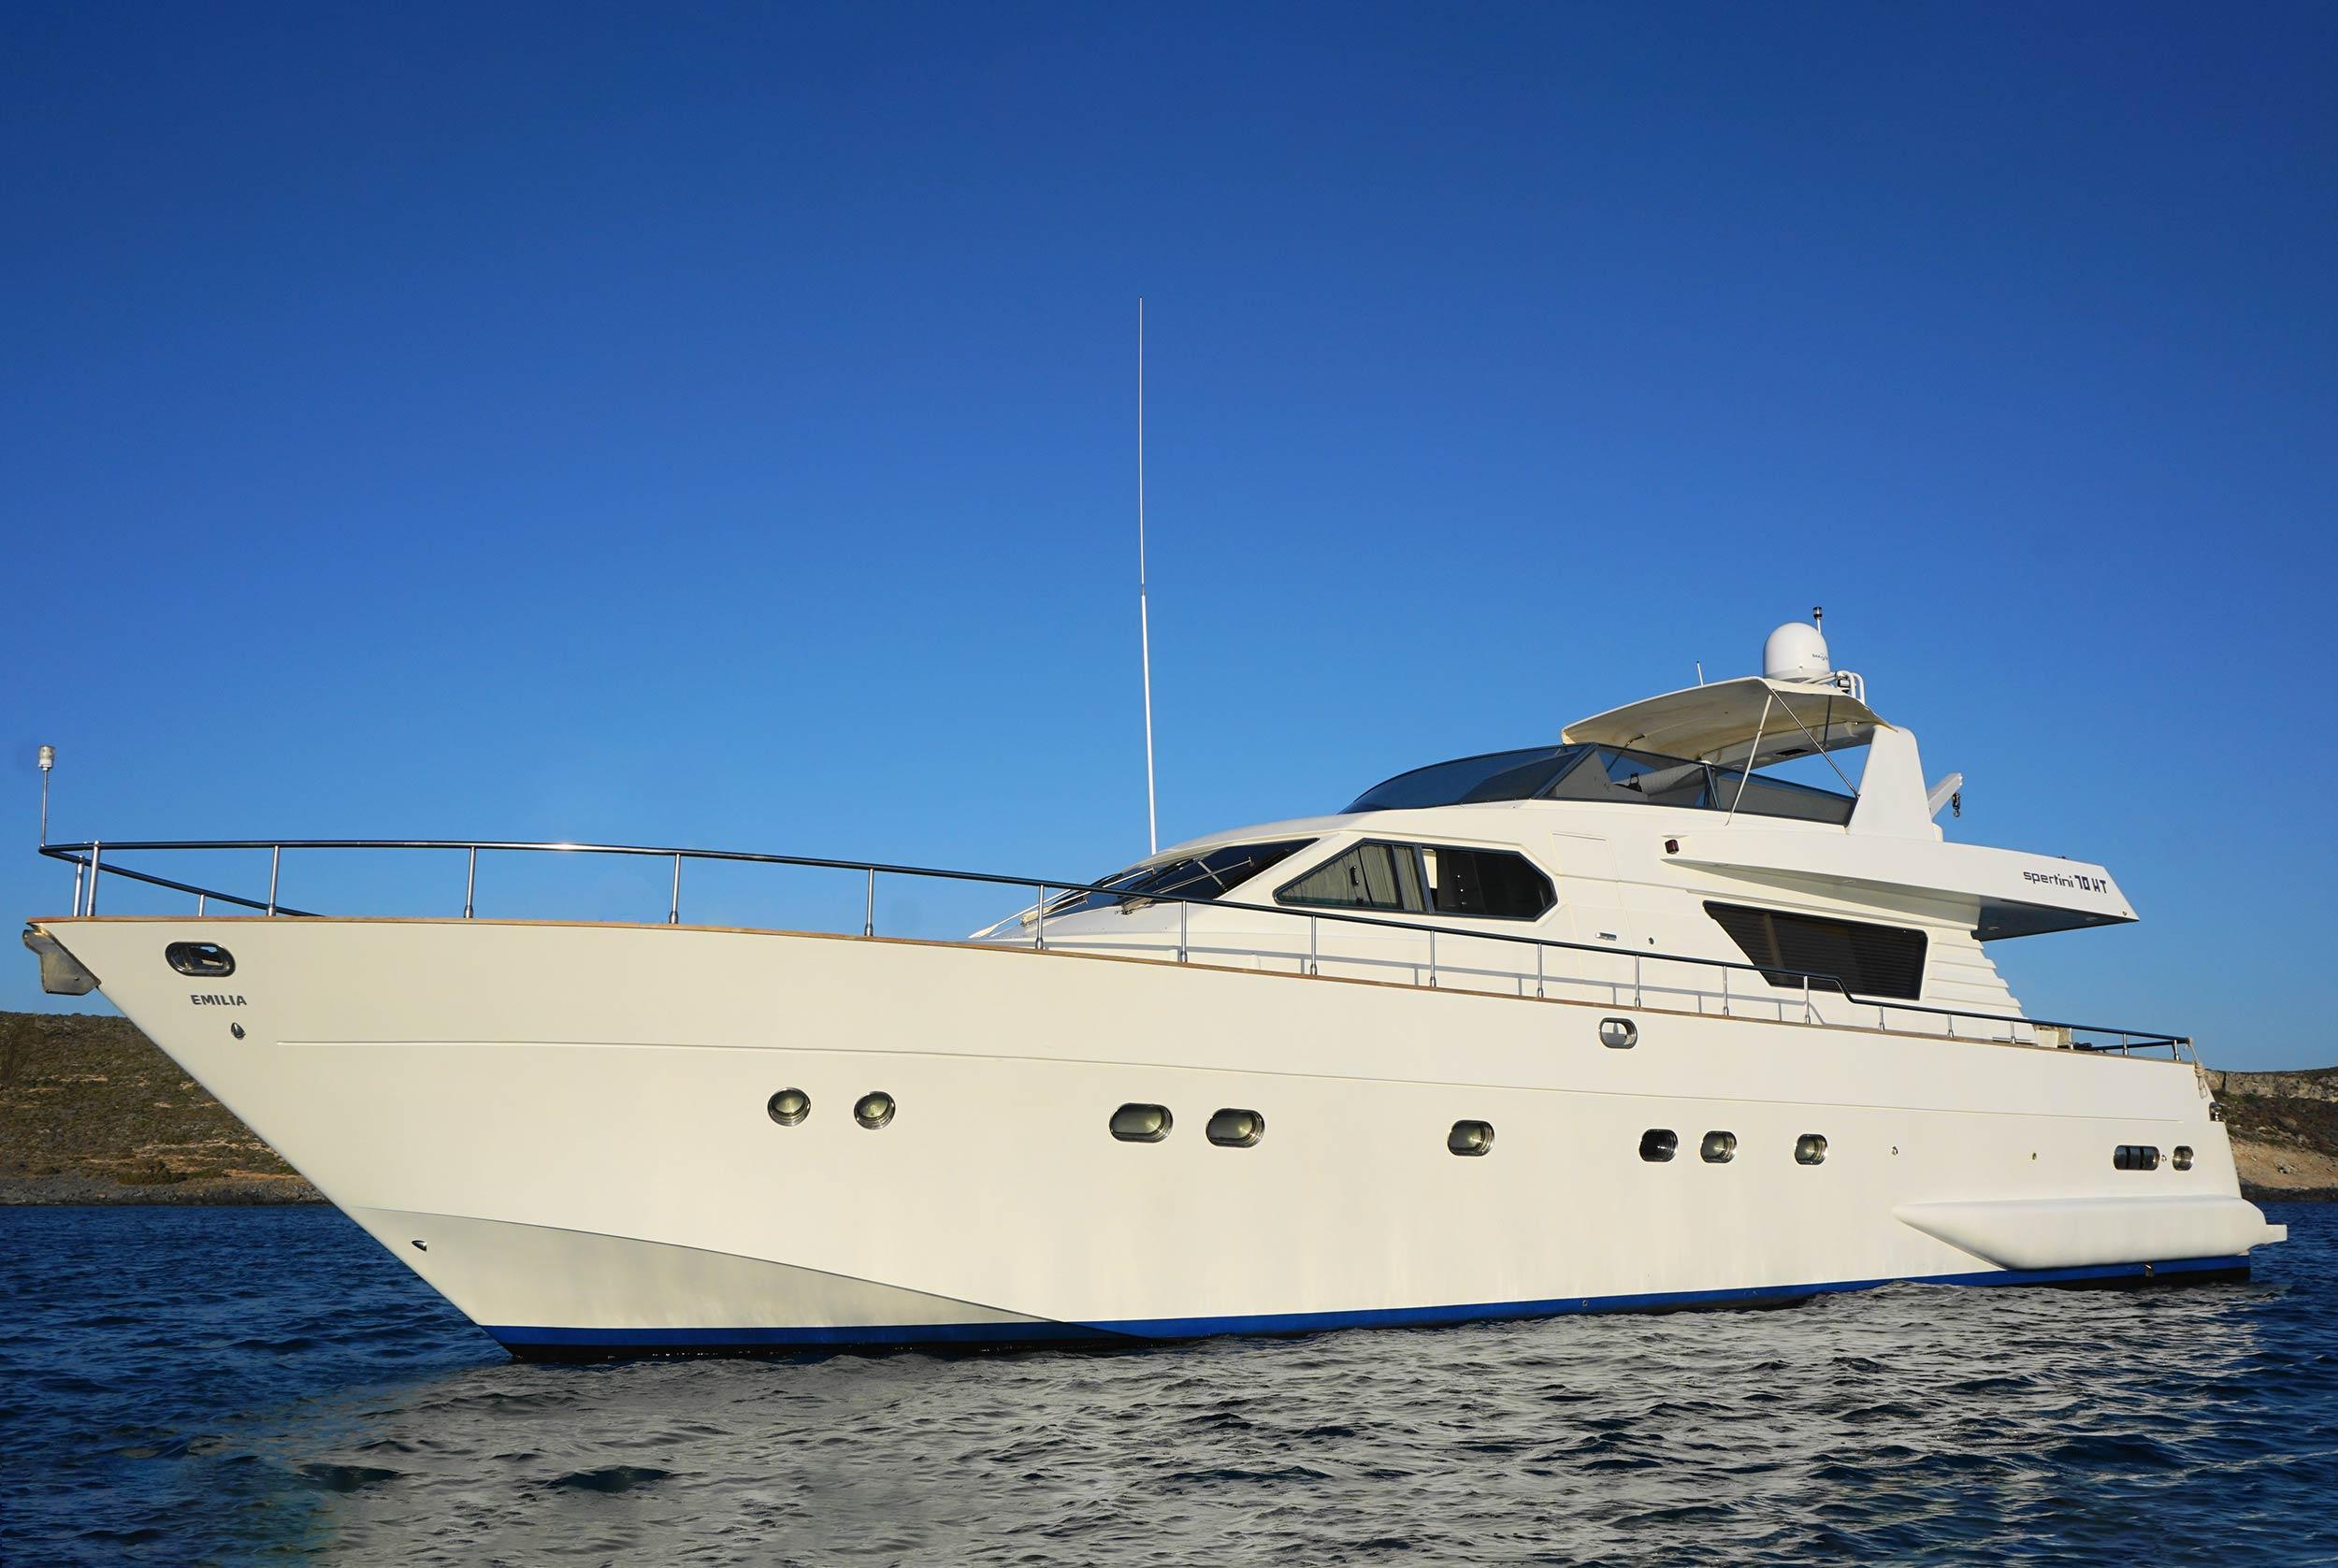 EMILIA Yacht Profile